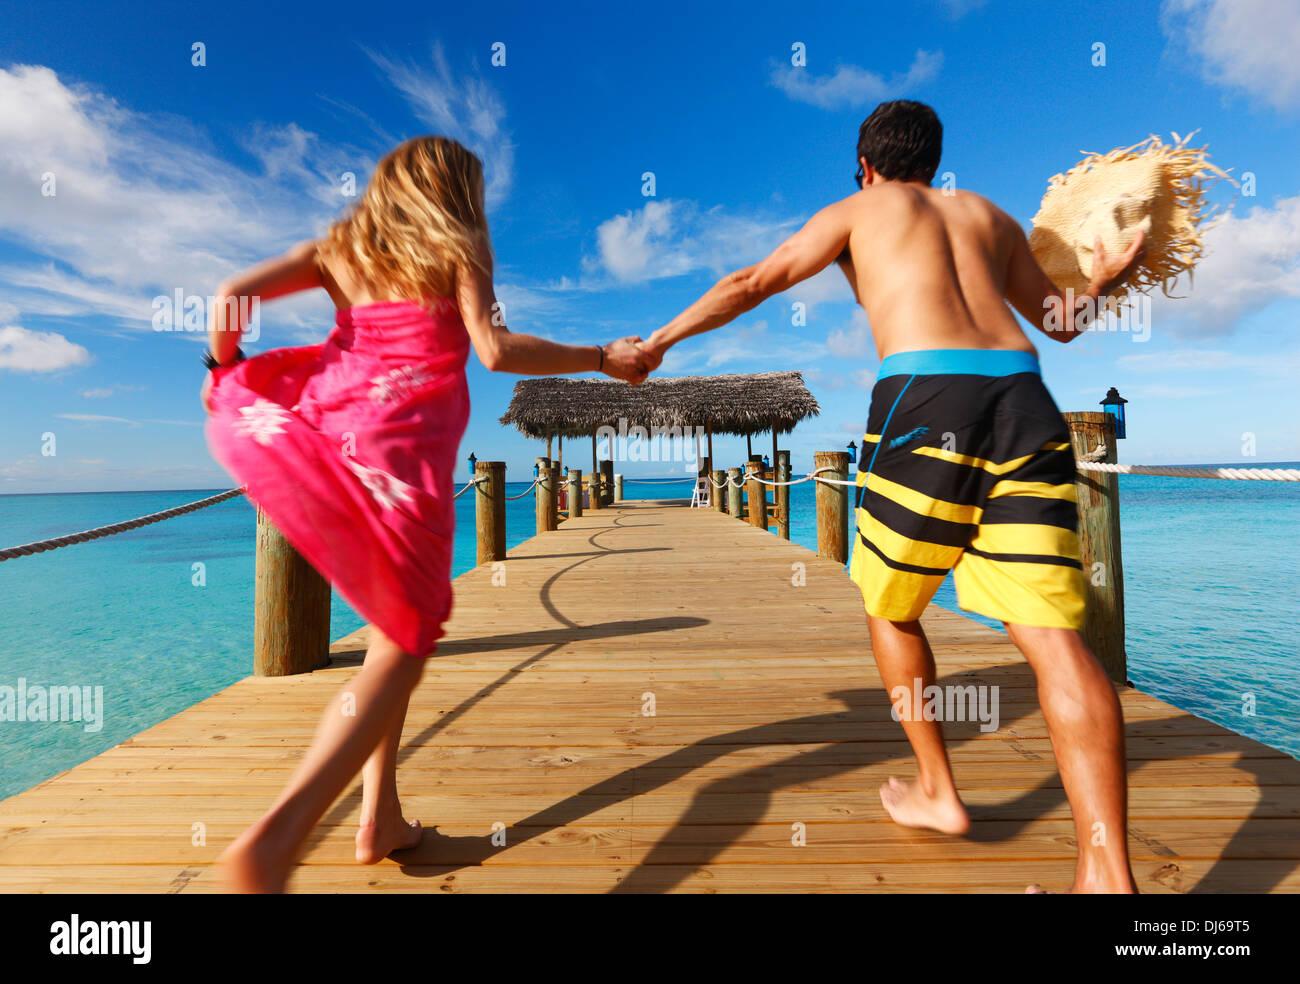 Junges Paar auf dem Holzsteg laufen.  Nassau, Bahamas, Karibik. Stockbild